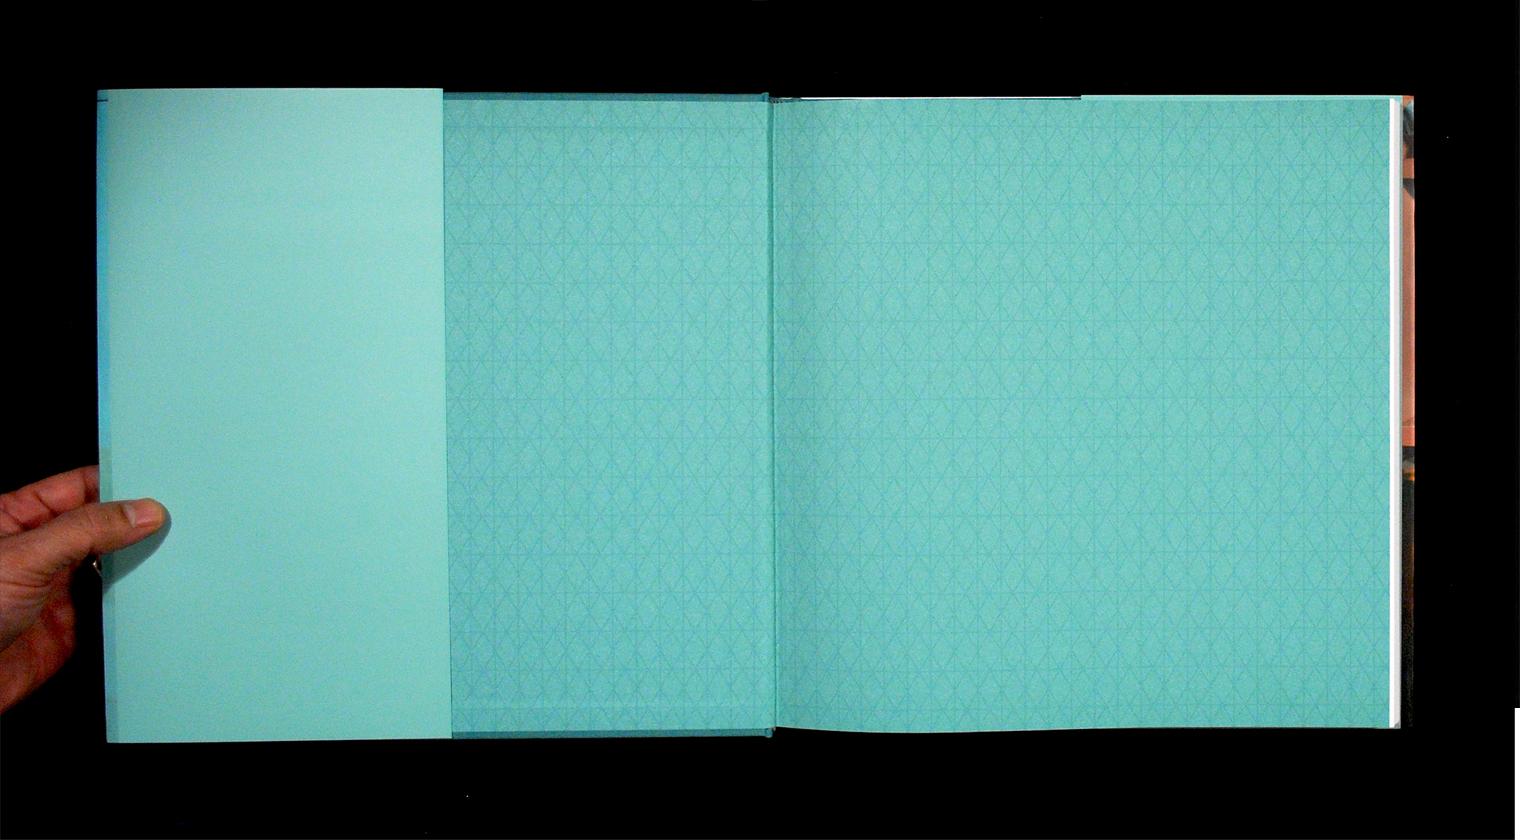 Paul and Bunny Mellon's Visual Biographies